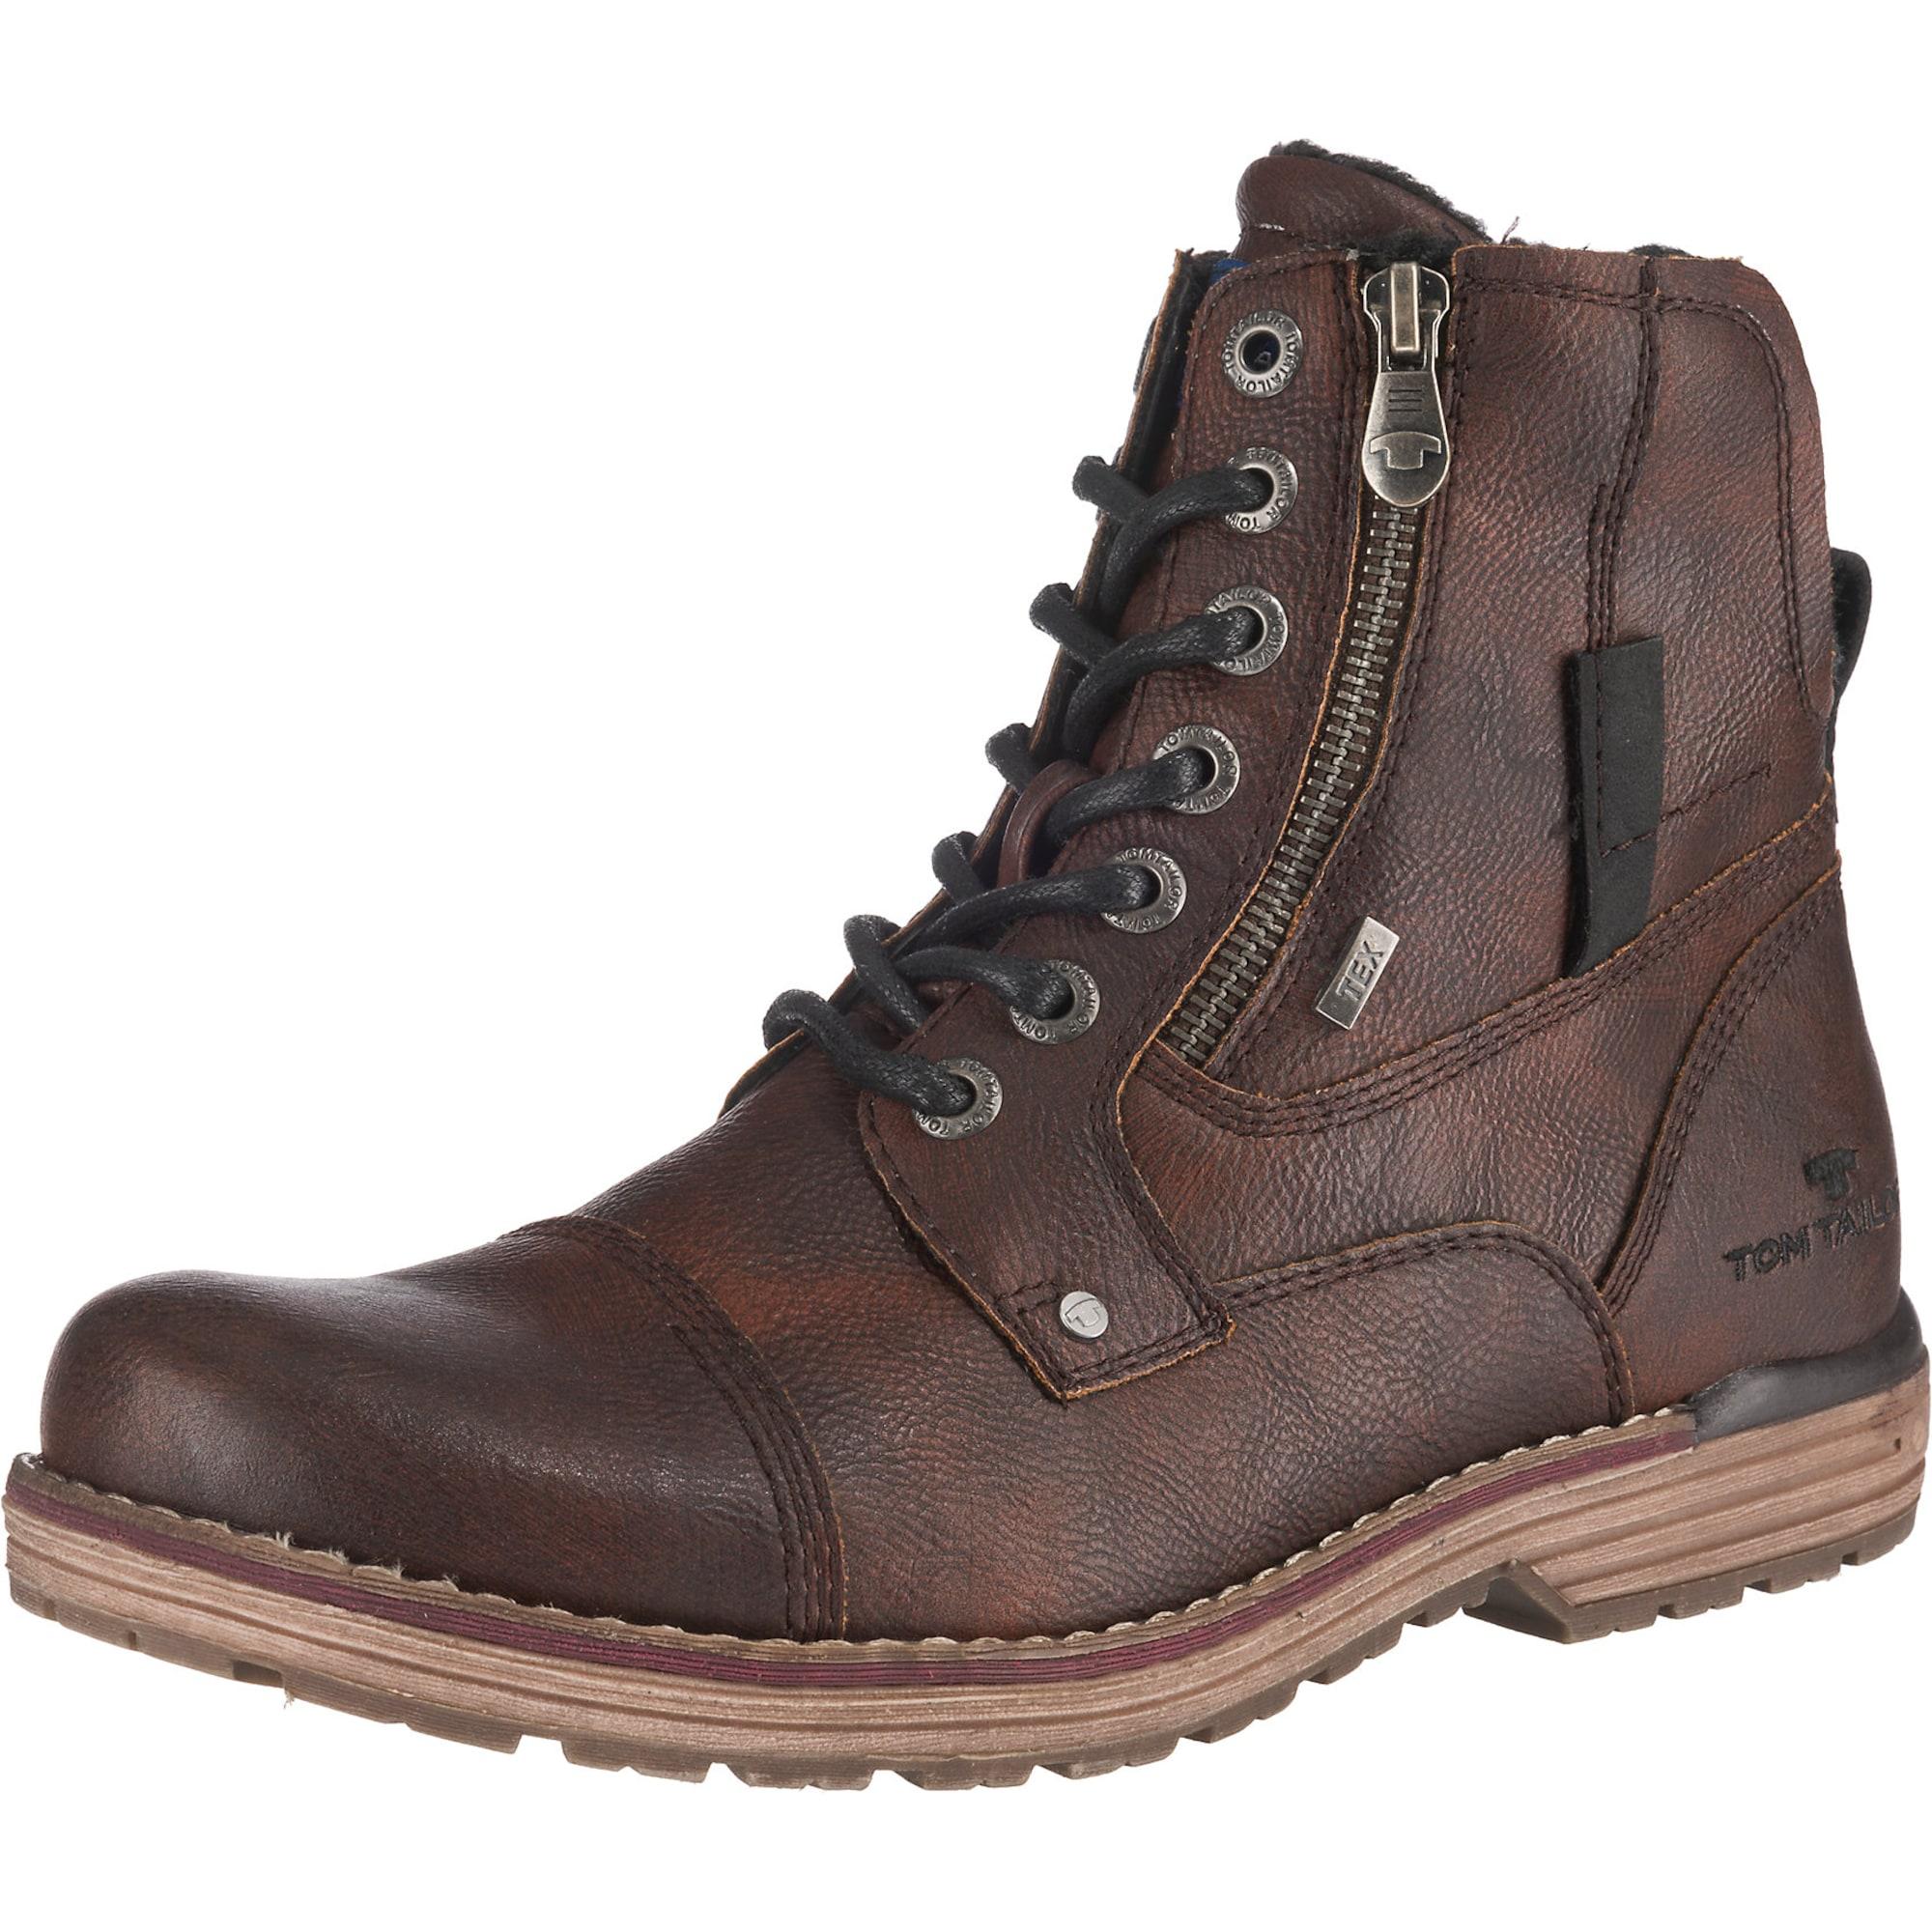 Winterstiefeletten | Schuhe > Boots > Winterstiefel | Tom Tailor